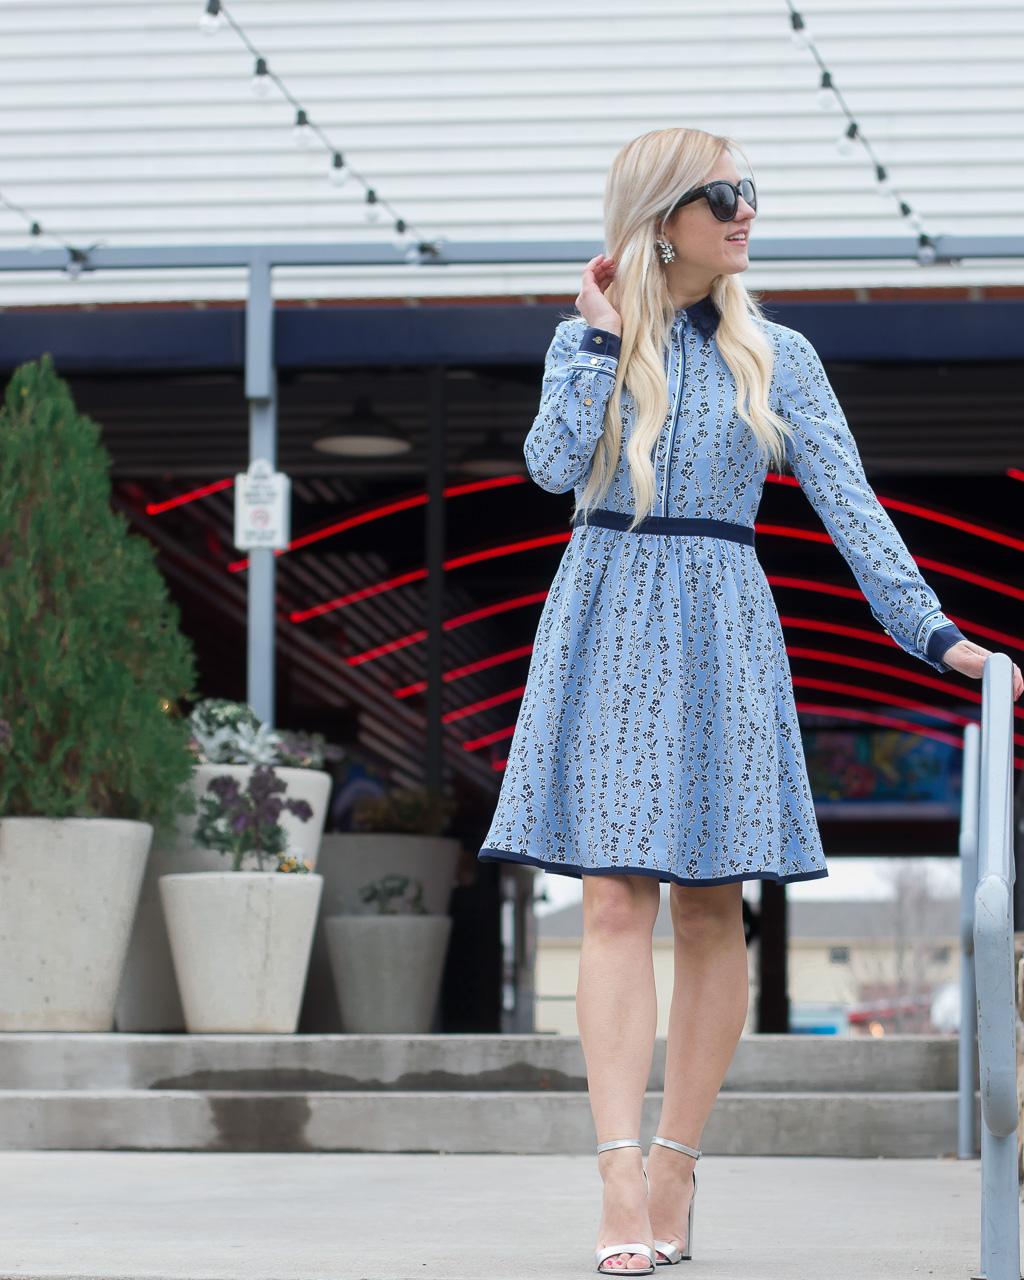 Southern style fashion blog